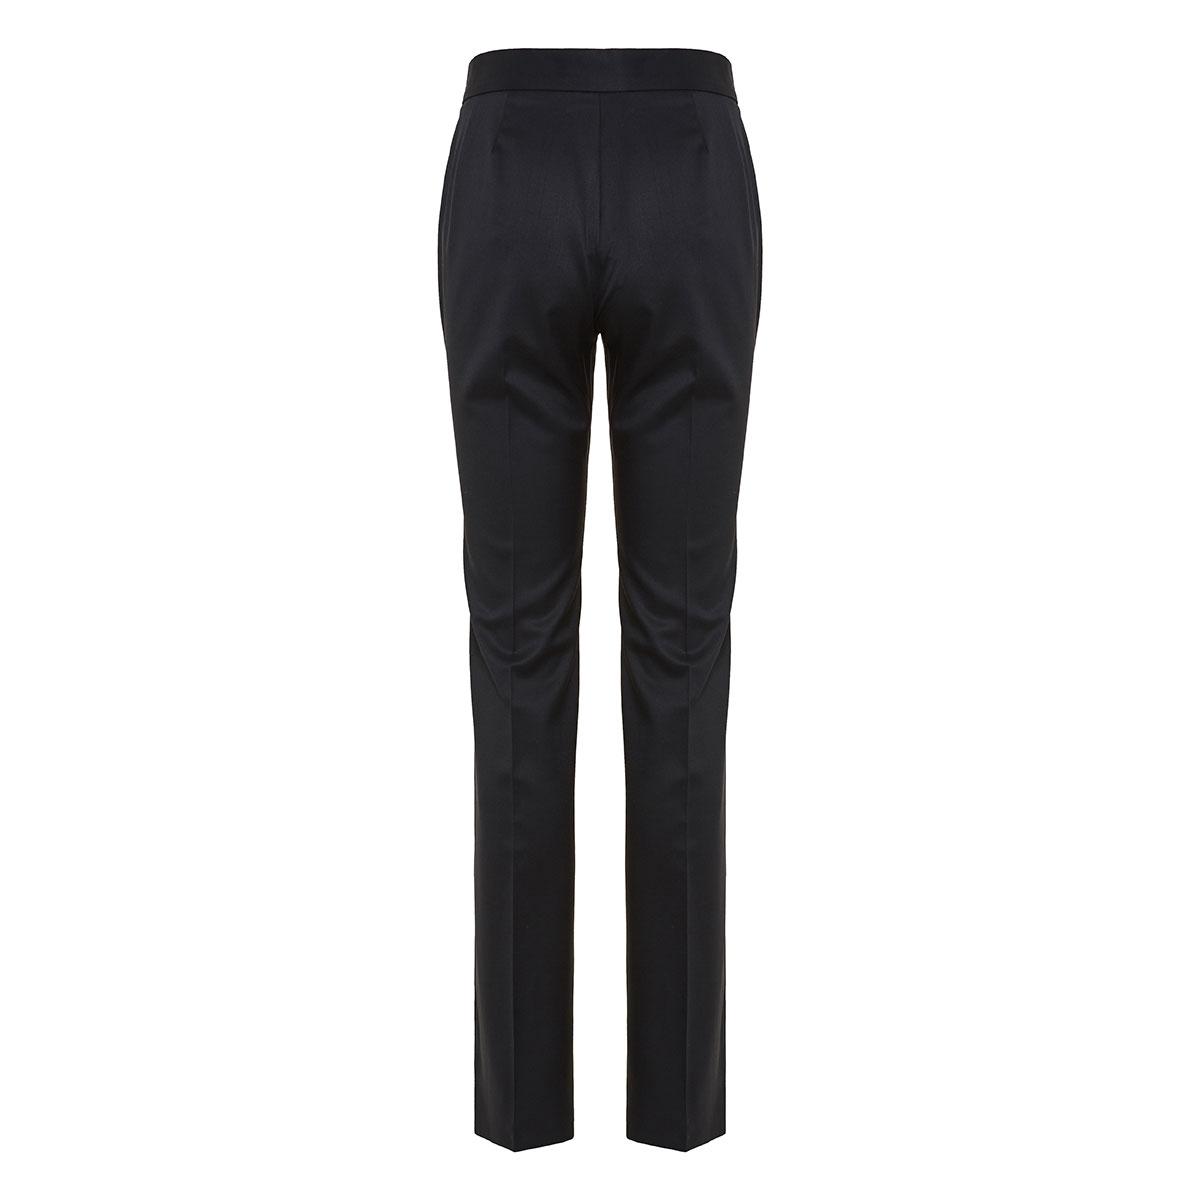 Apollo Bay tailored trousers